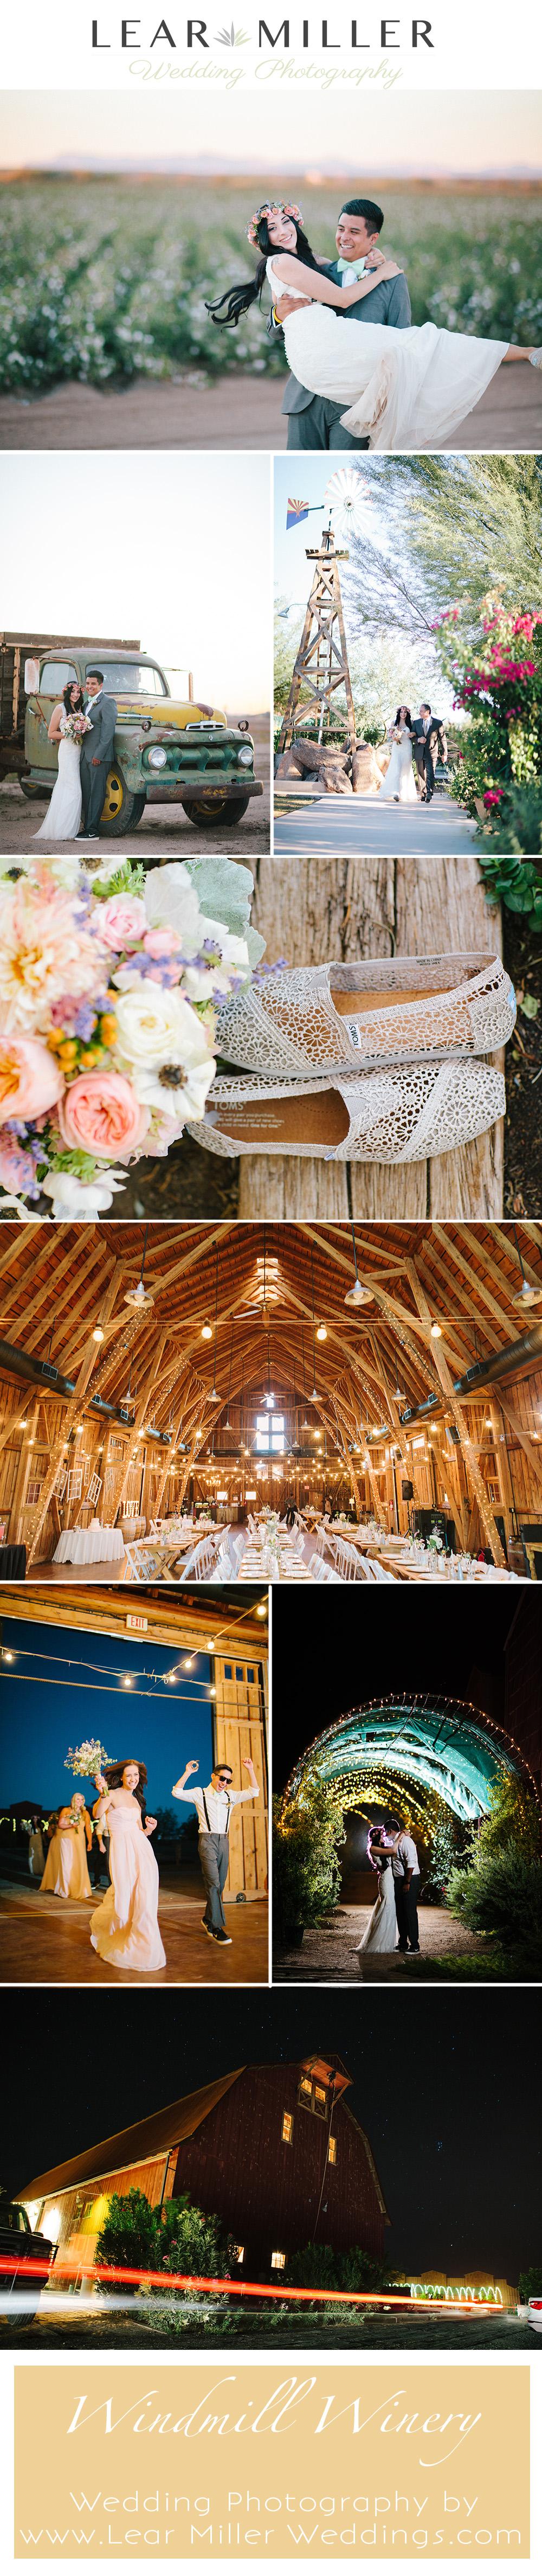 Windmill Winery Barn Weddings, Arizona wedding venues ...